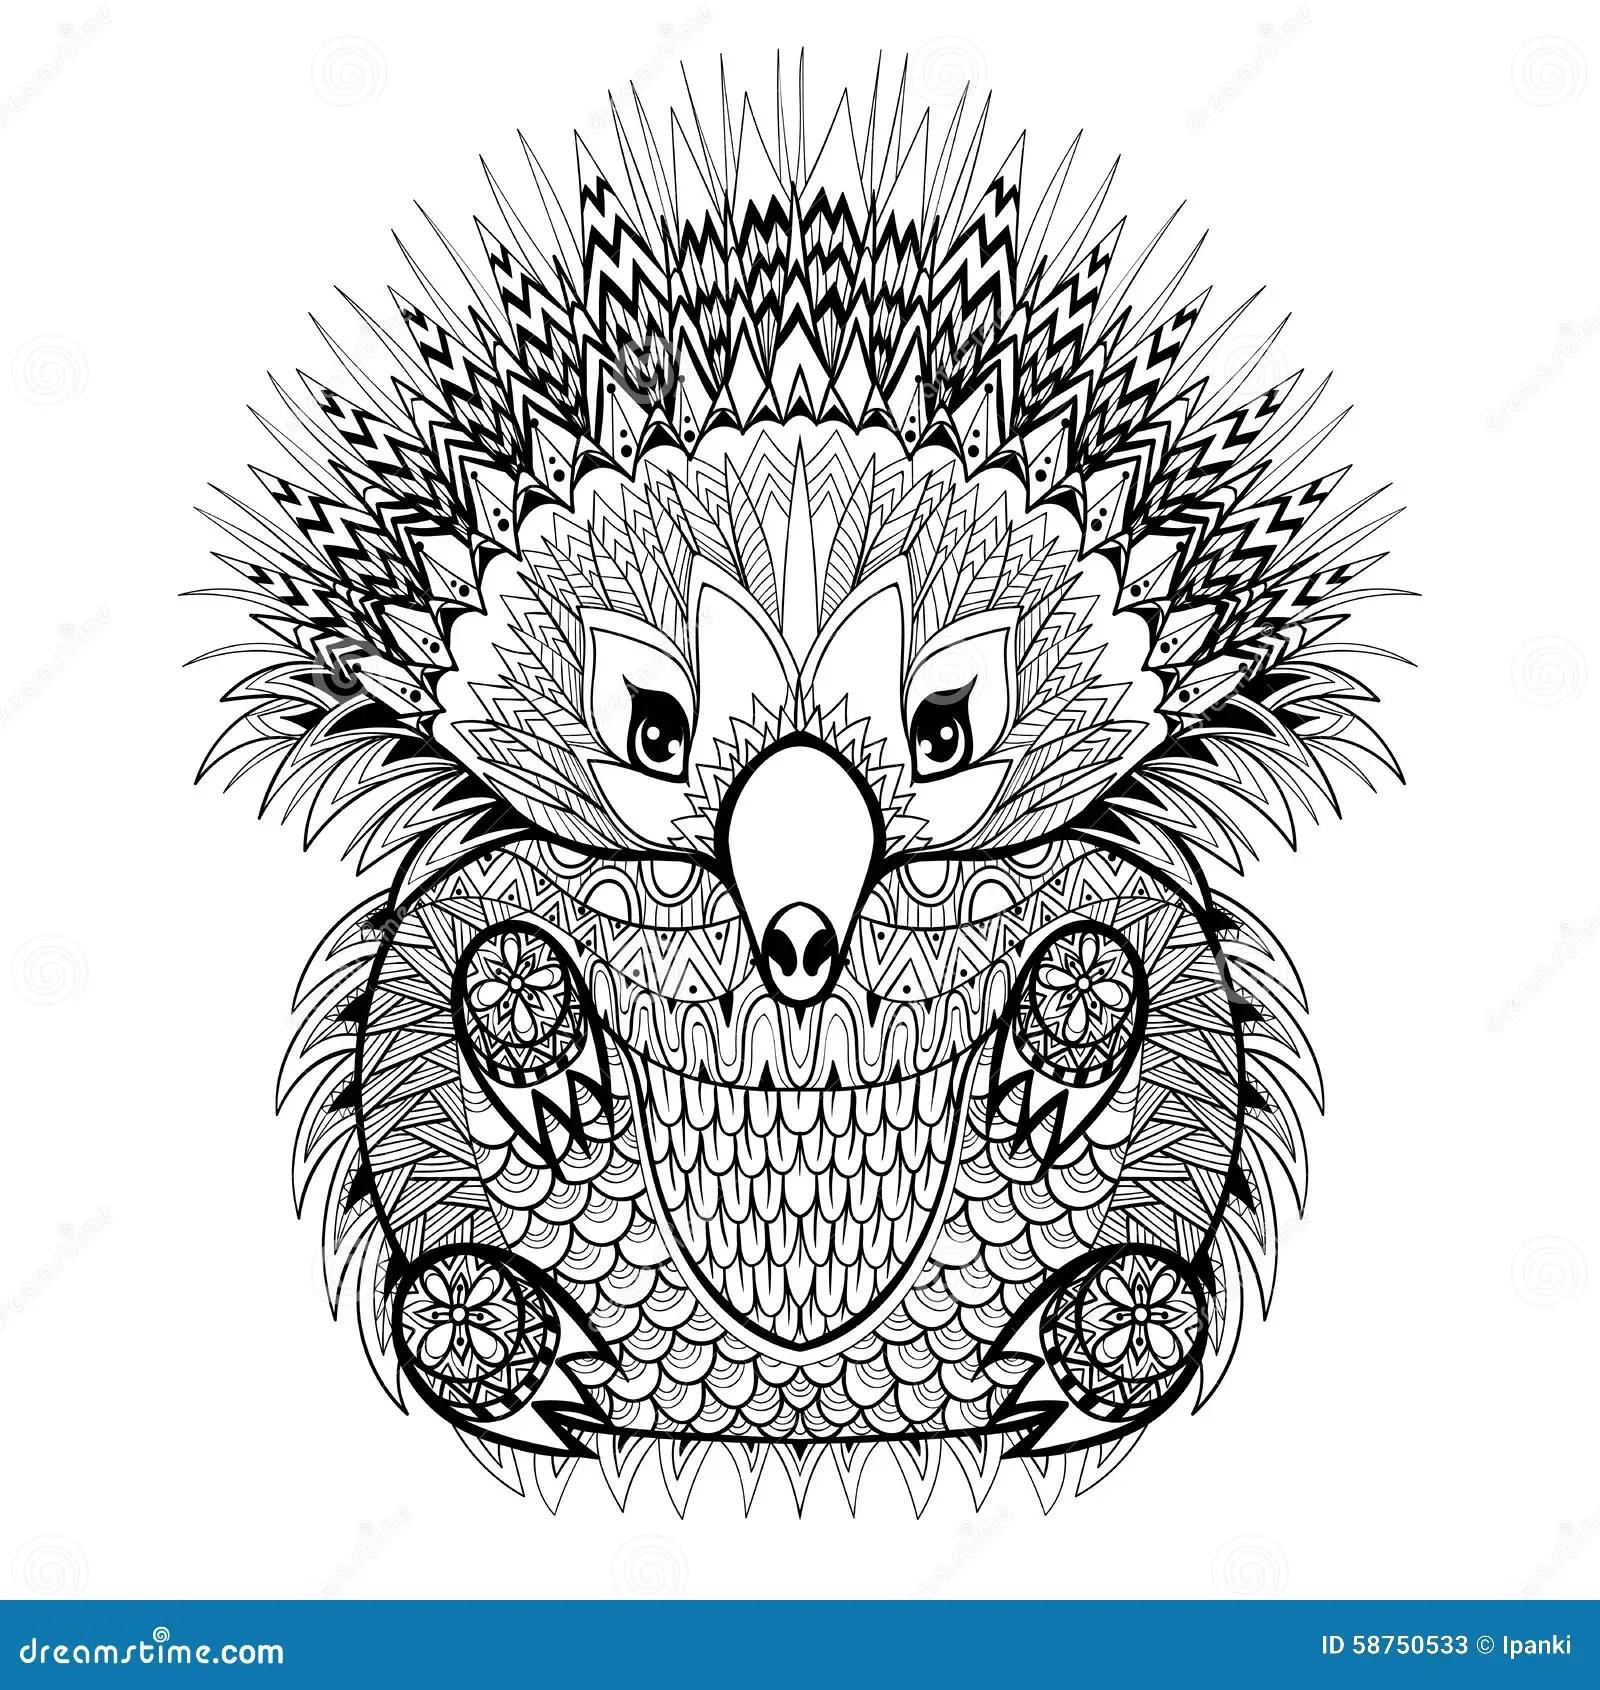 Echidna Cartoons Illustrations Amp Vector Stock Images